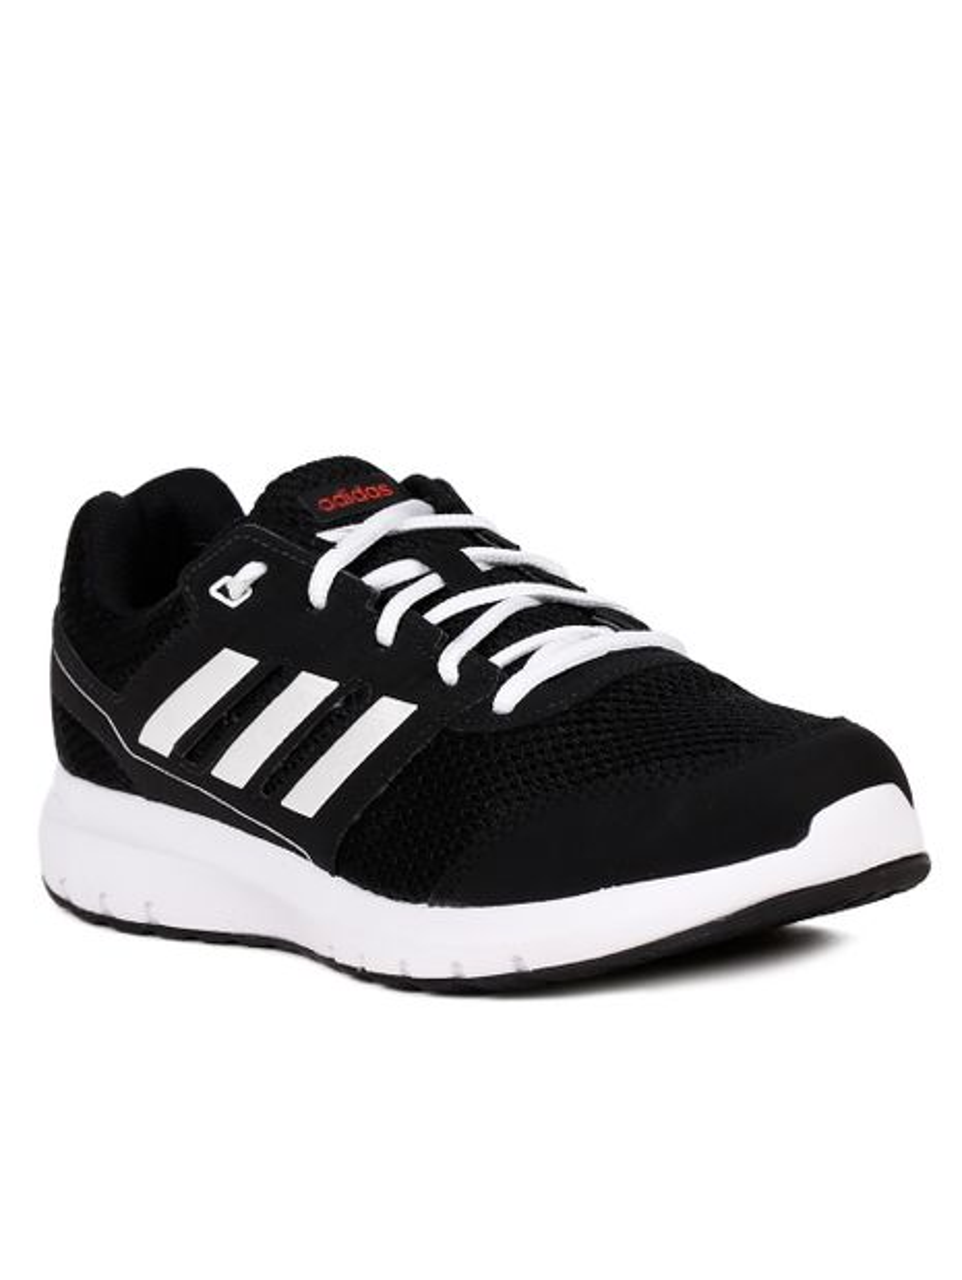 Tênis Esportivo Feminino Adidas Duramo Lite 2.0 Preto/branco